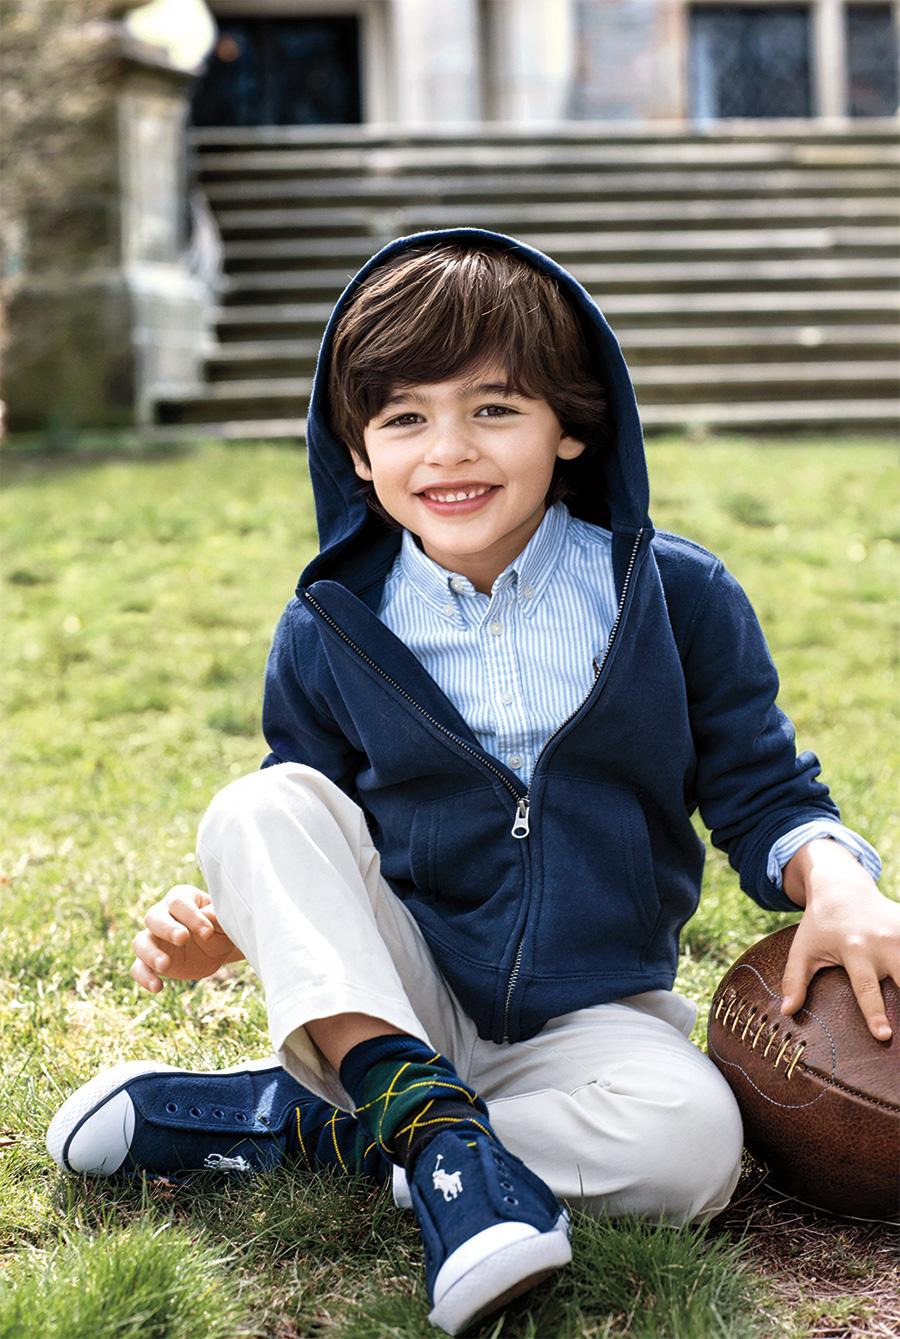 Ralph Lauren Kids' Clothing   Nordstrom,+ followers on Twitter.